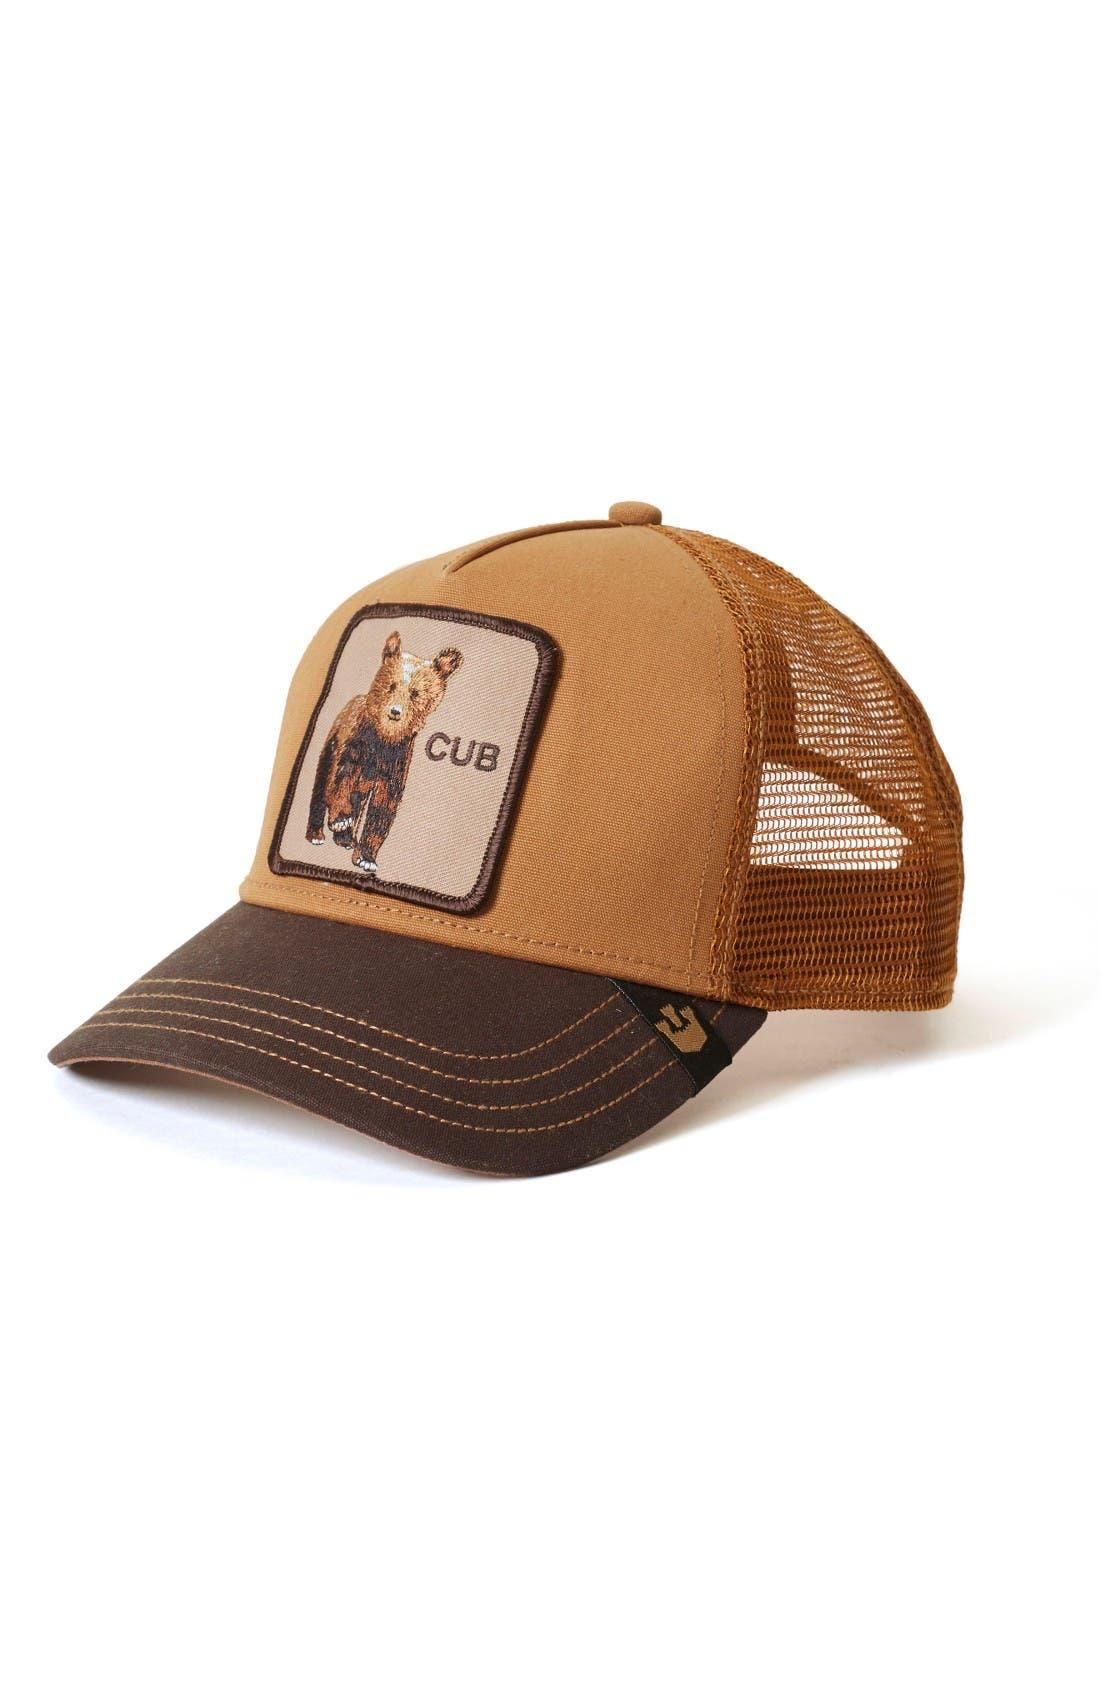 Cub Trucker Hat,                         Main,                         color, Brown